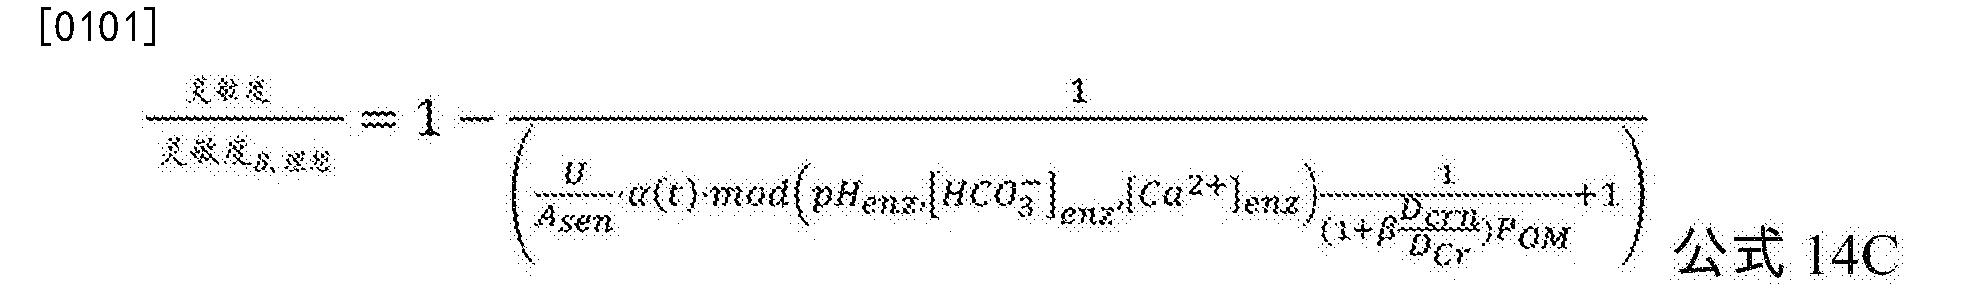 Figure CN107810409AD00104